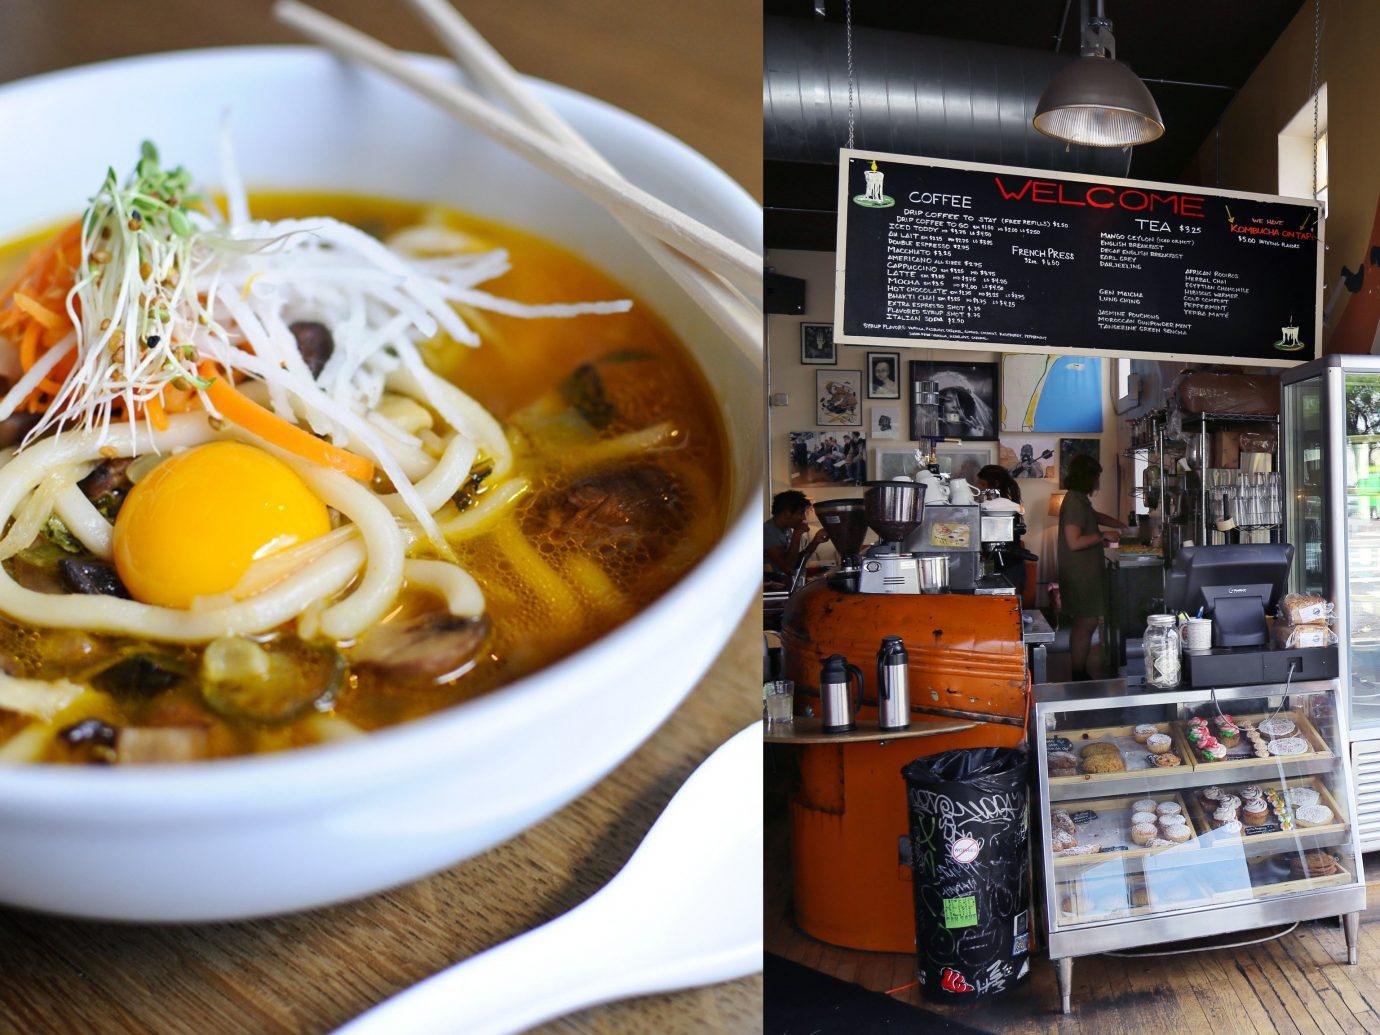 Food + Drink food indoor dish plate soup cuisine meal noodle asian food